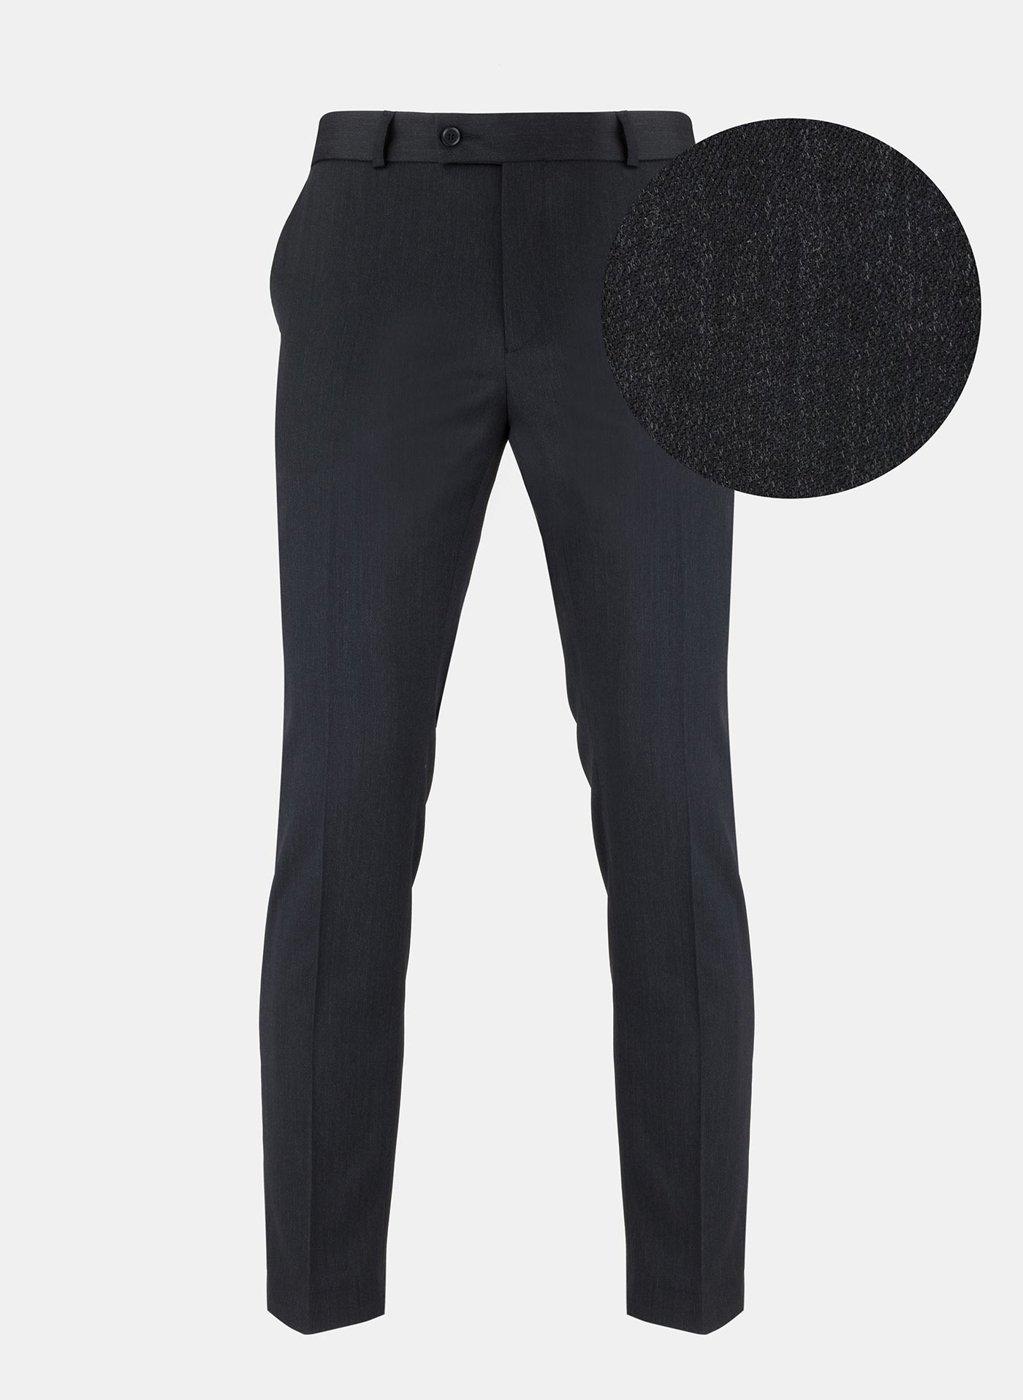 Spodnie męskie garniturowe LESARR PLM-6G-198-C